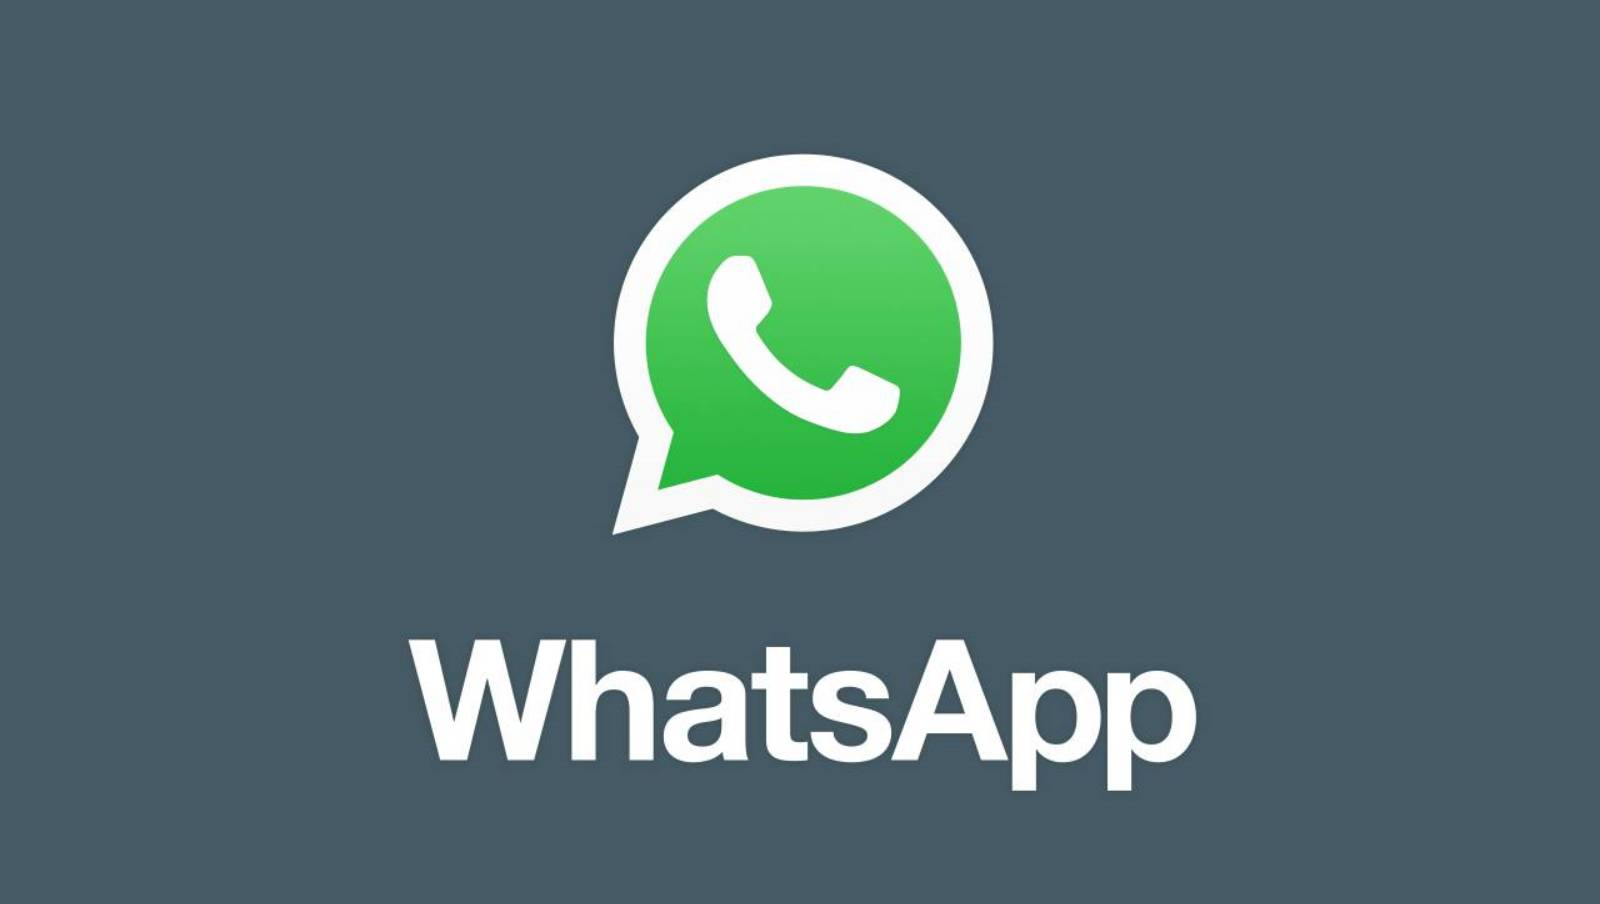 WhatsApp anunt decizie radicala facebook